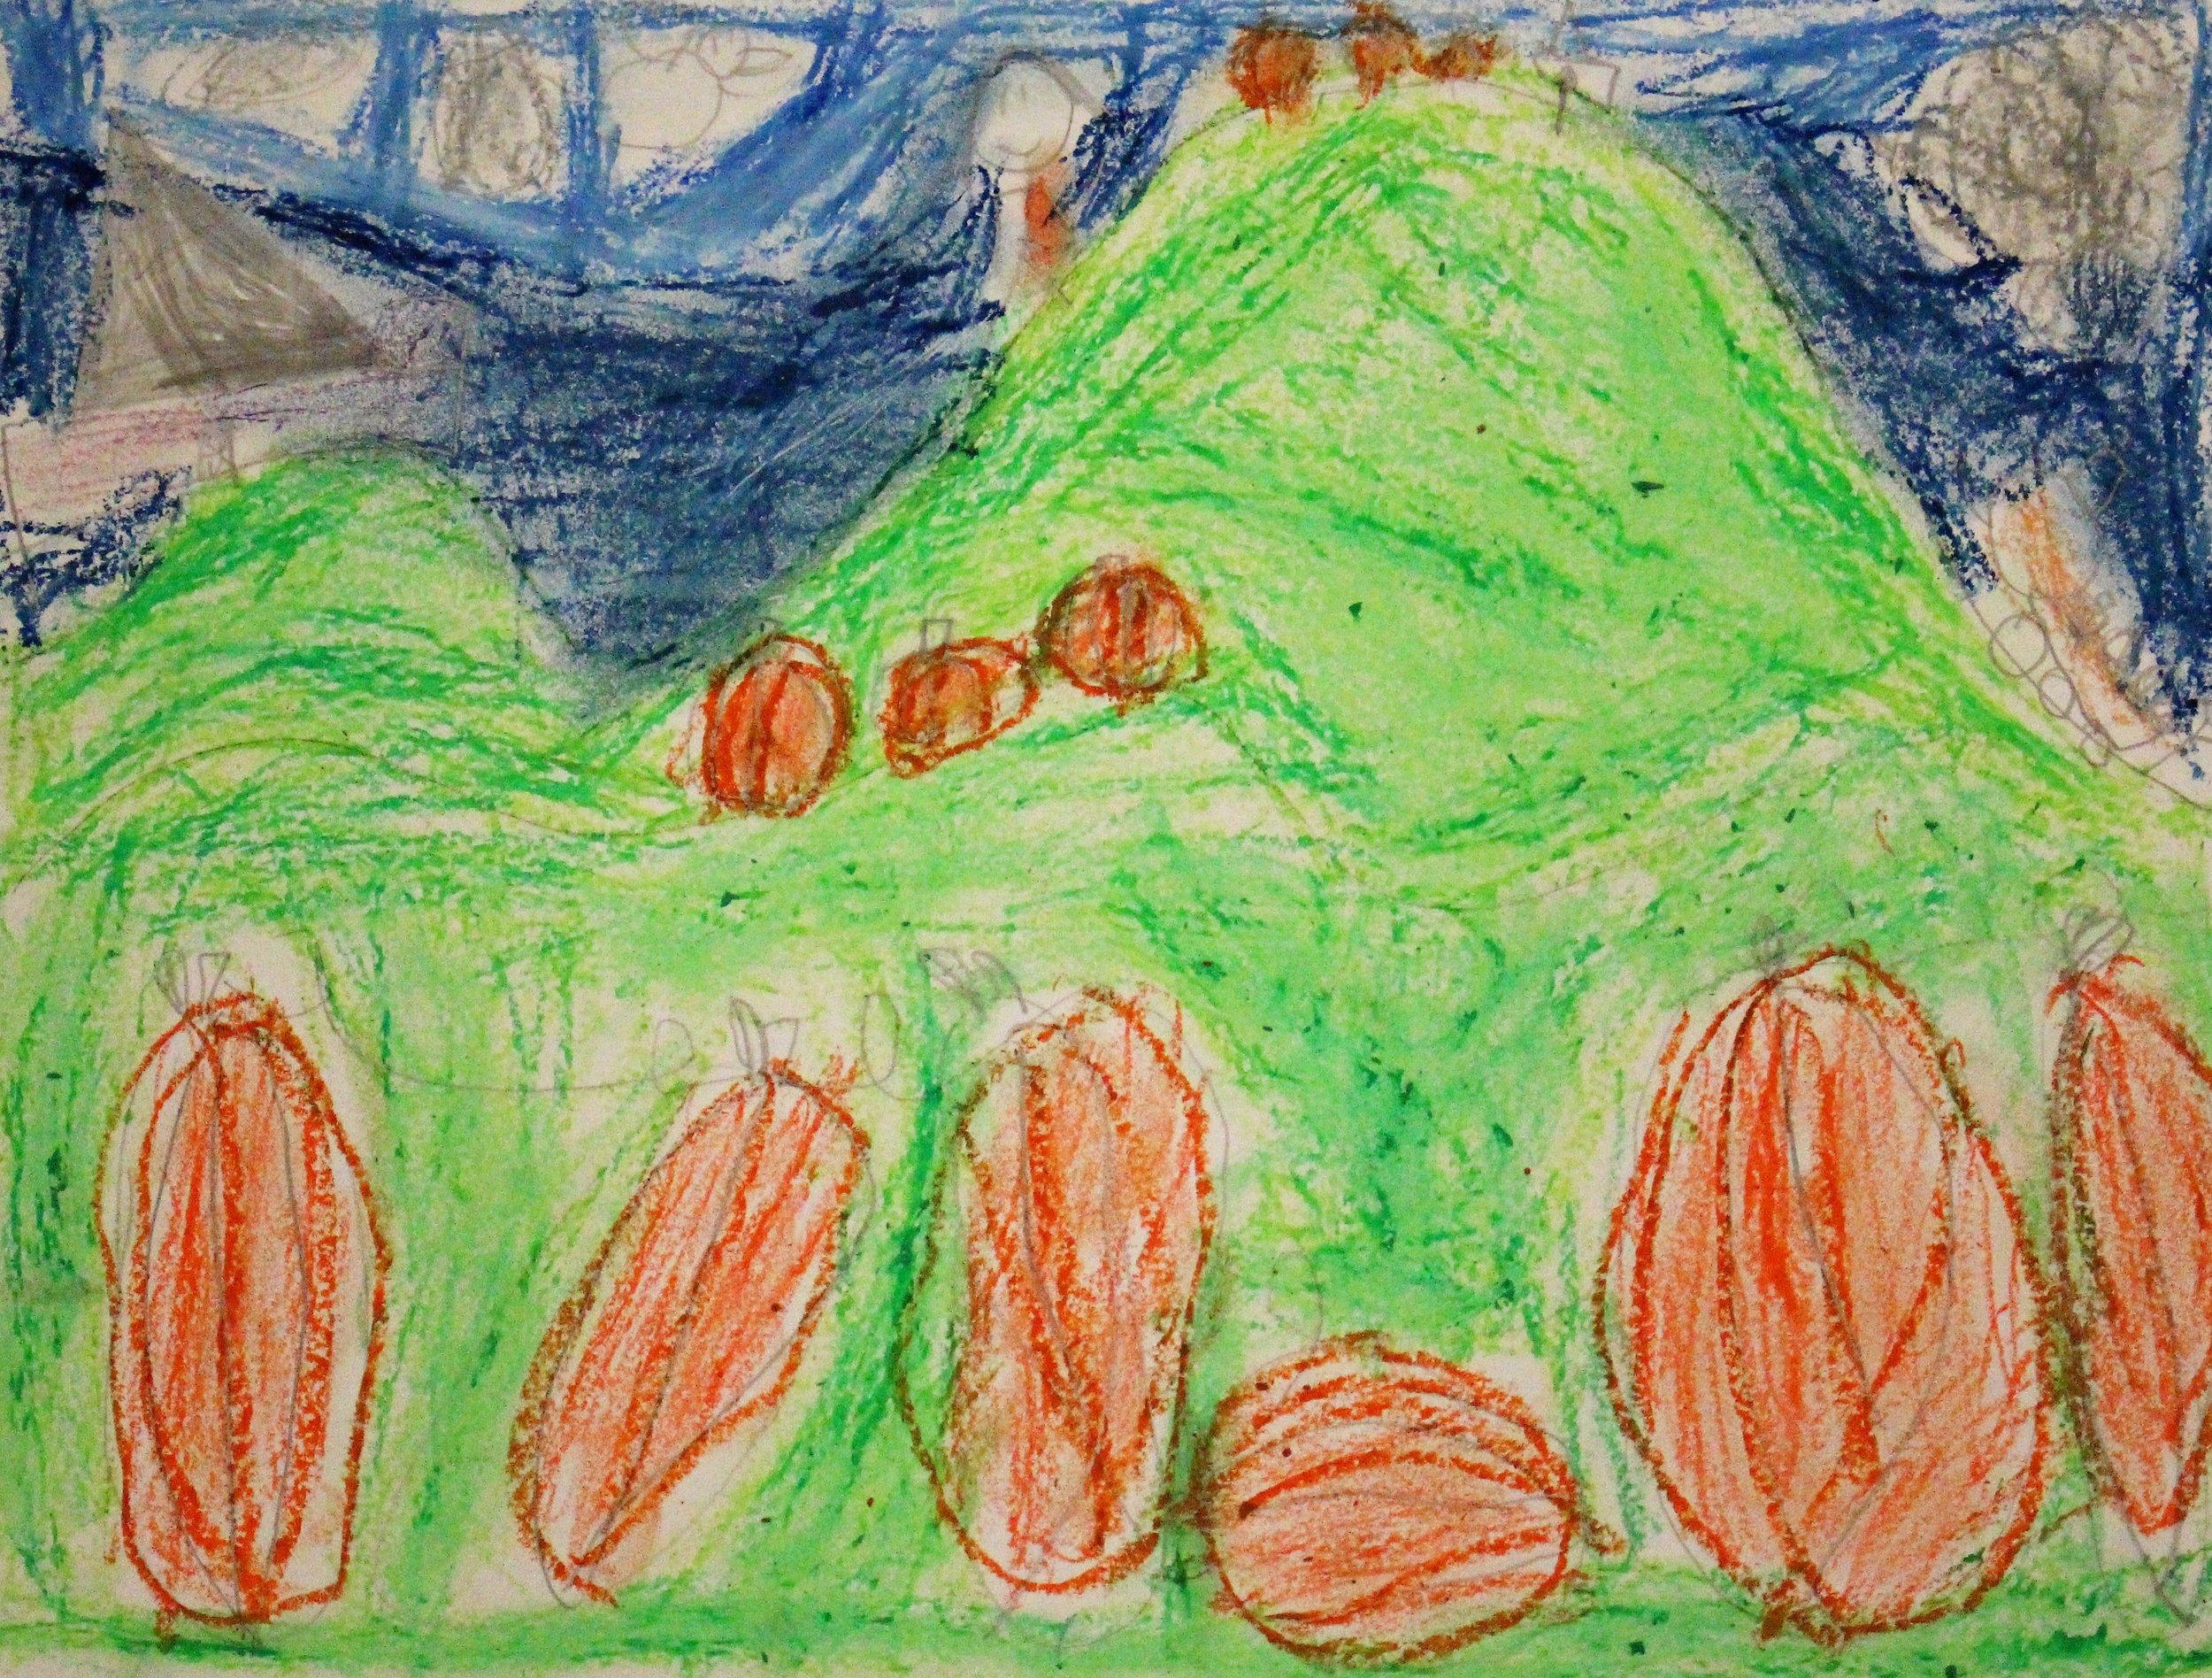 1st Grade: Kimberly C. - Artwork: Landscapes: Pumpkin Patch